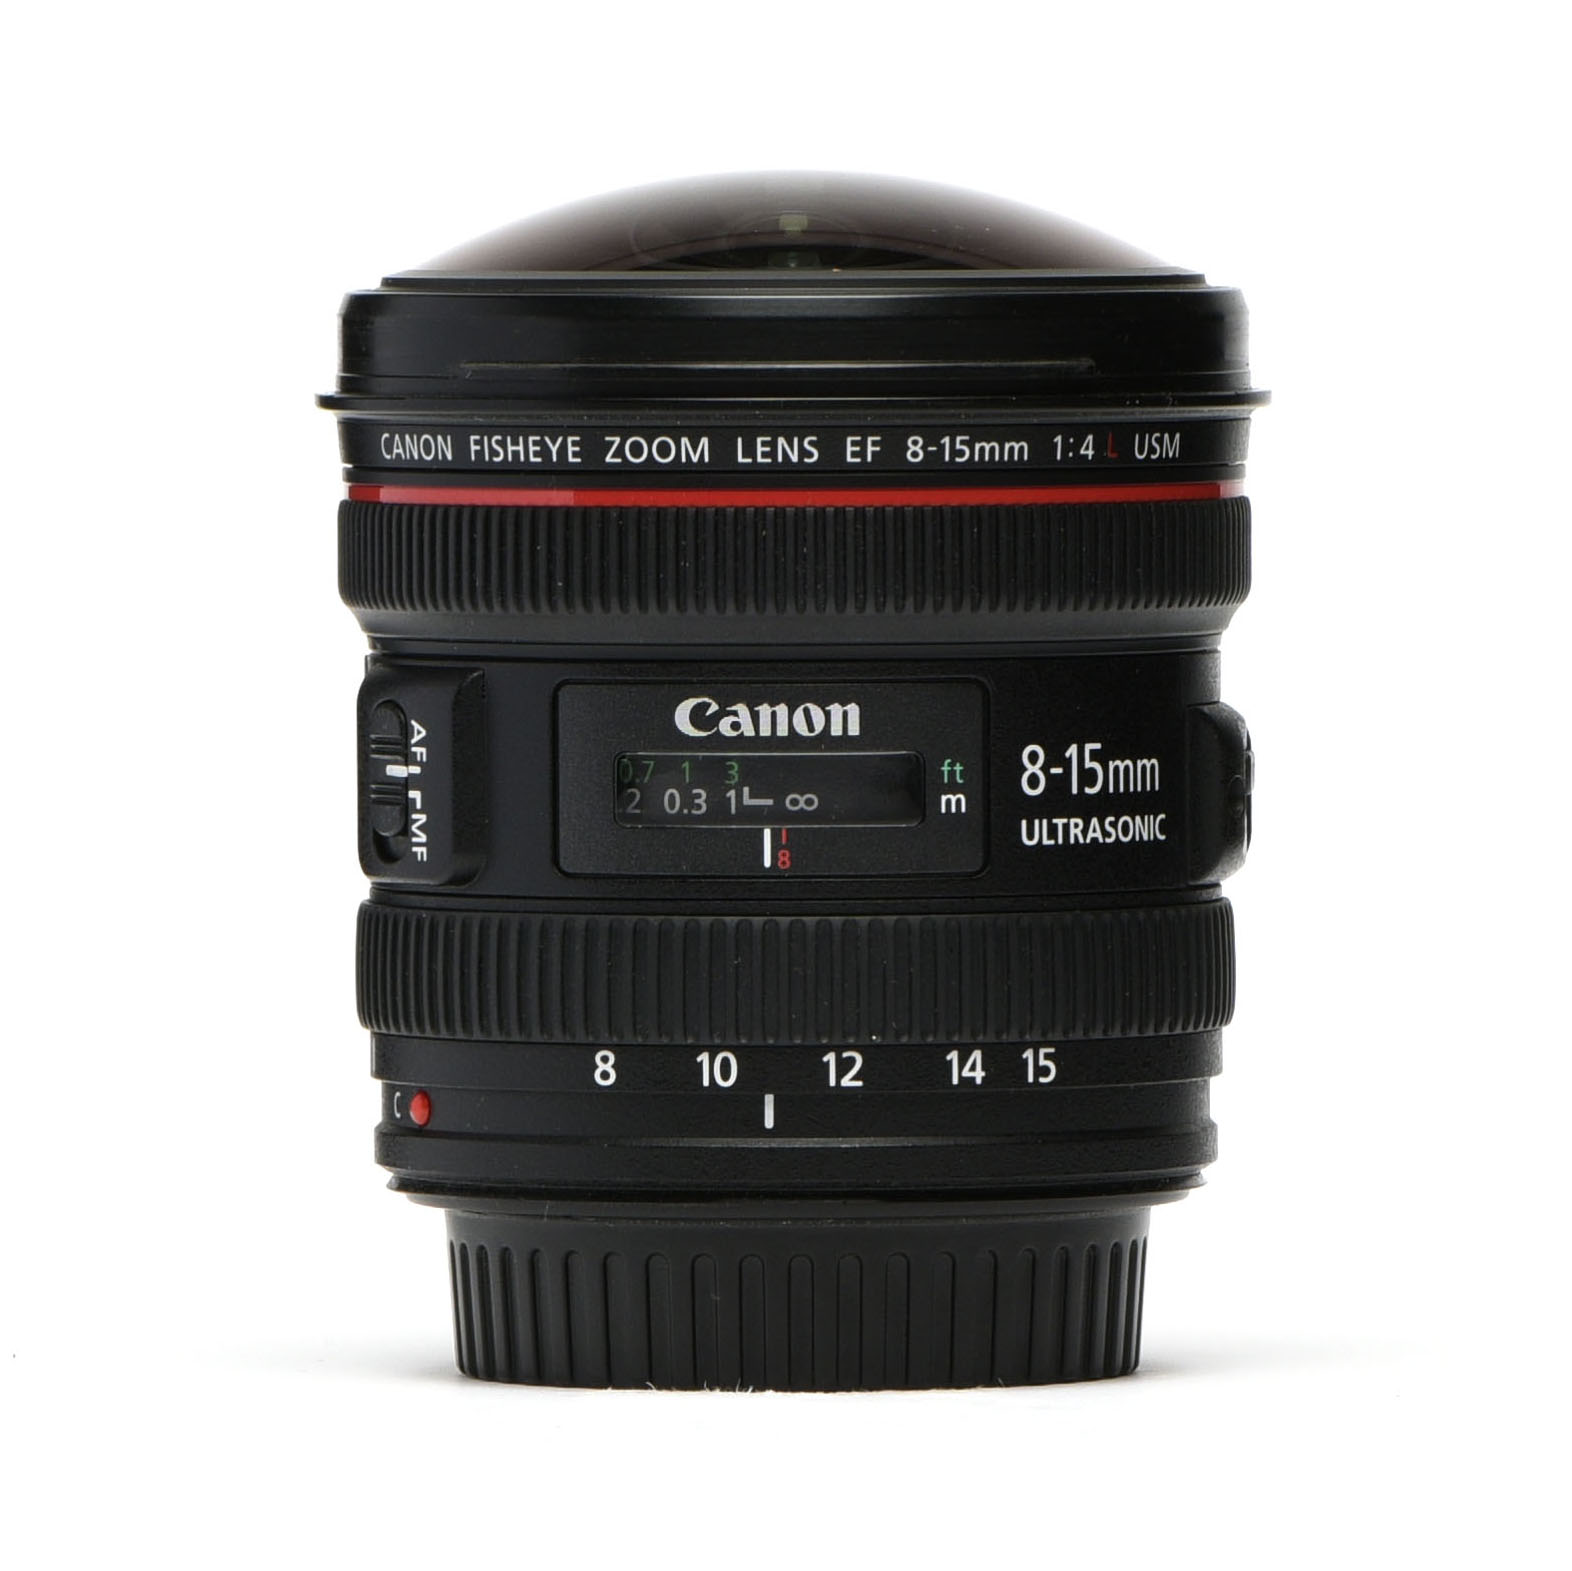 Canon EF 8-15mm F/4L Fisheye USM Zoom Lens - PRG Gear